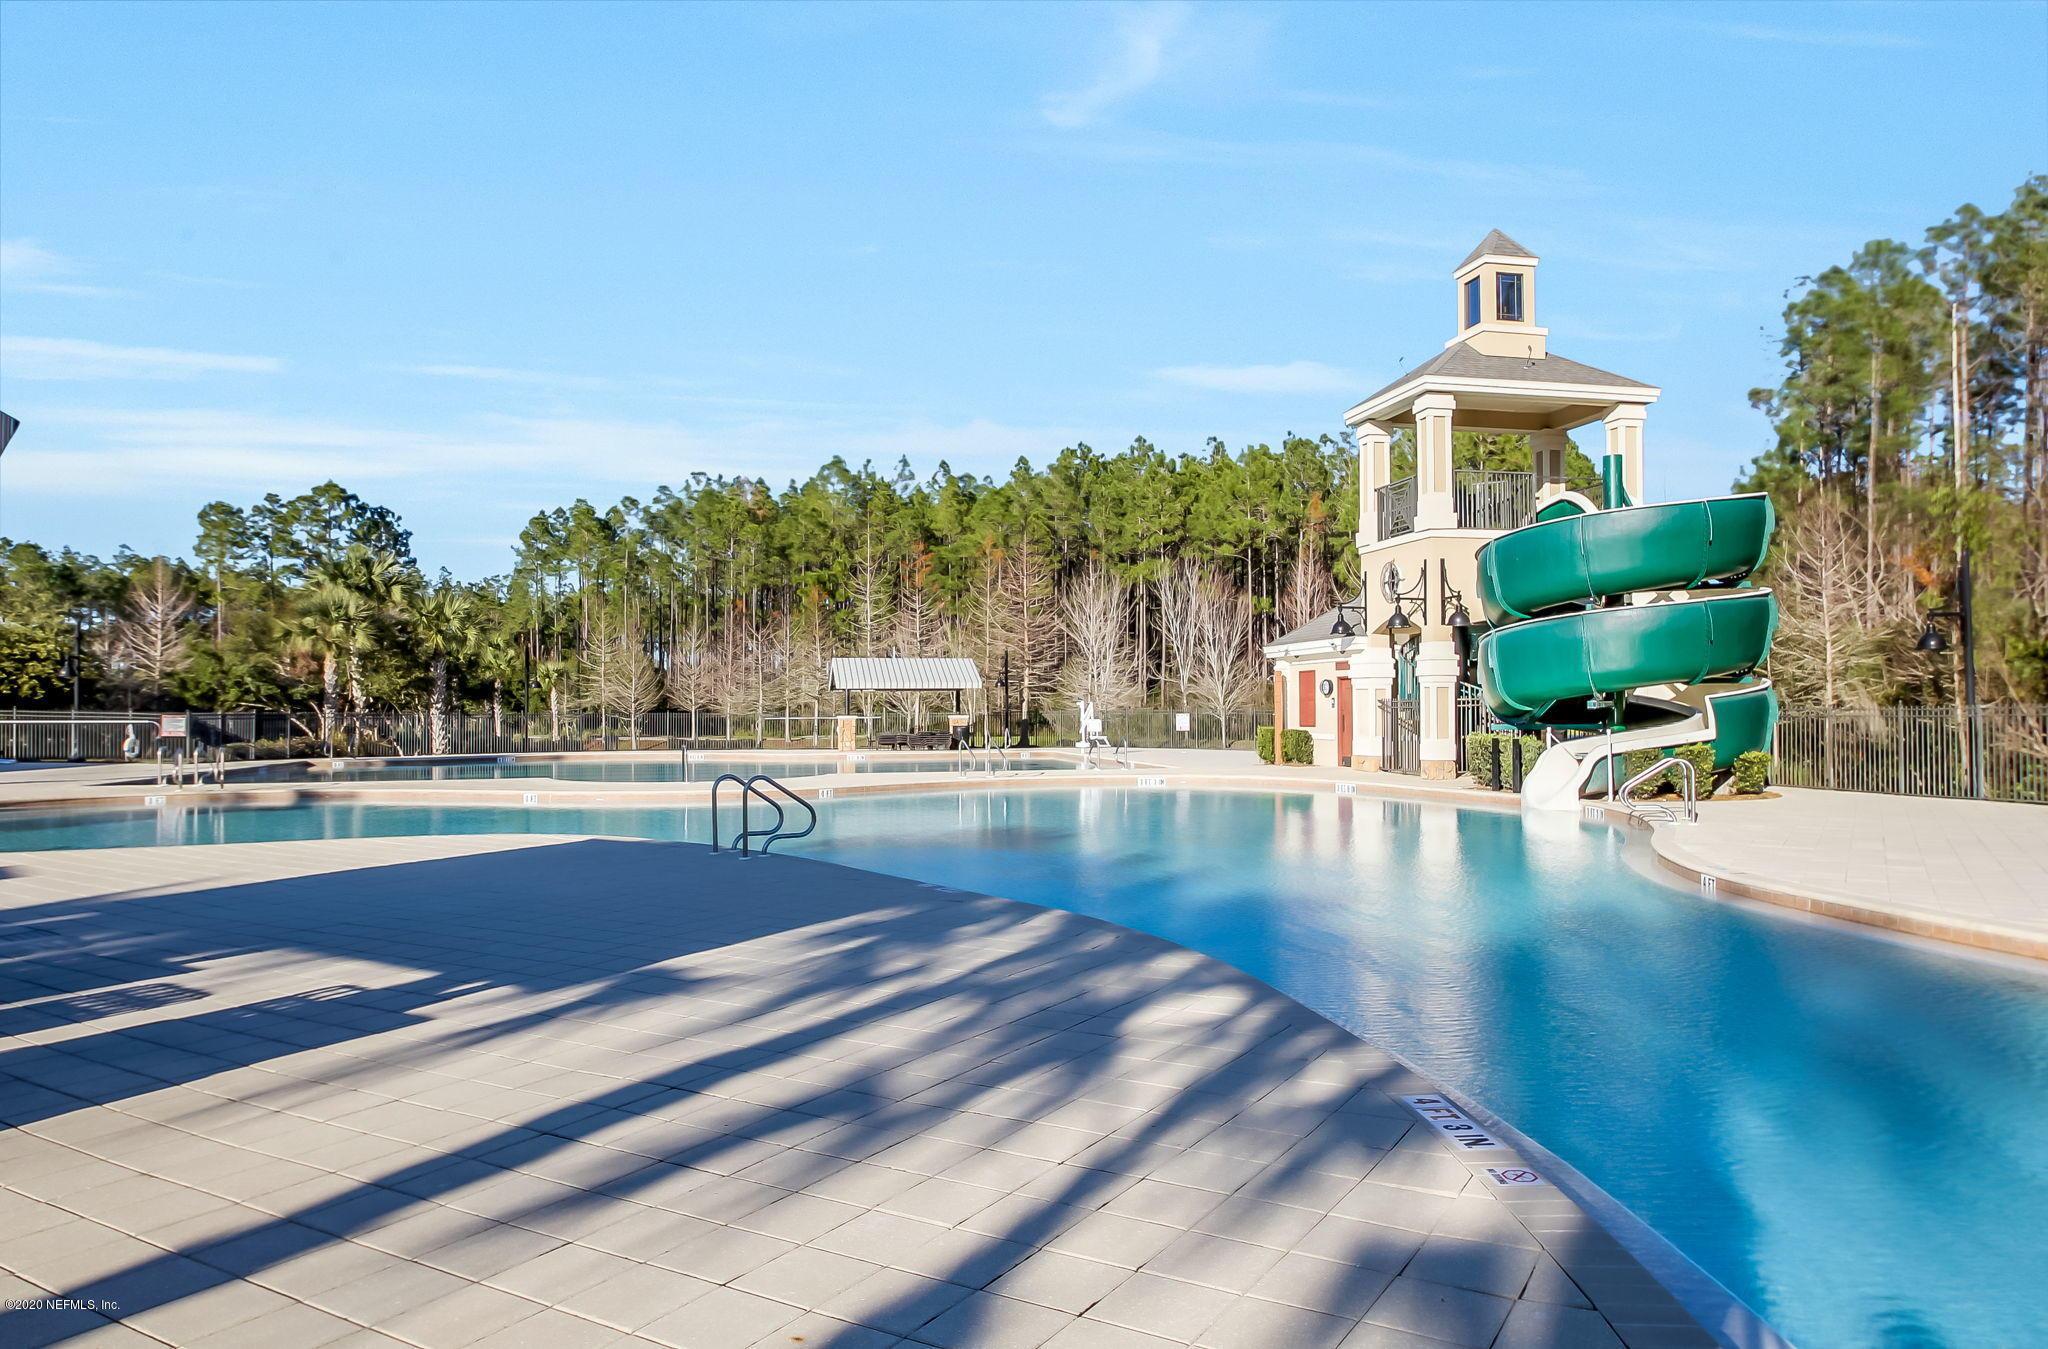 474 SHETLAND, ST JOHNS, FLORIDA 32259, 3 Bedrooms Bedrooms, ,2 BathroomsBathrooms,Residential,For sale,SHETLAND,1081223